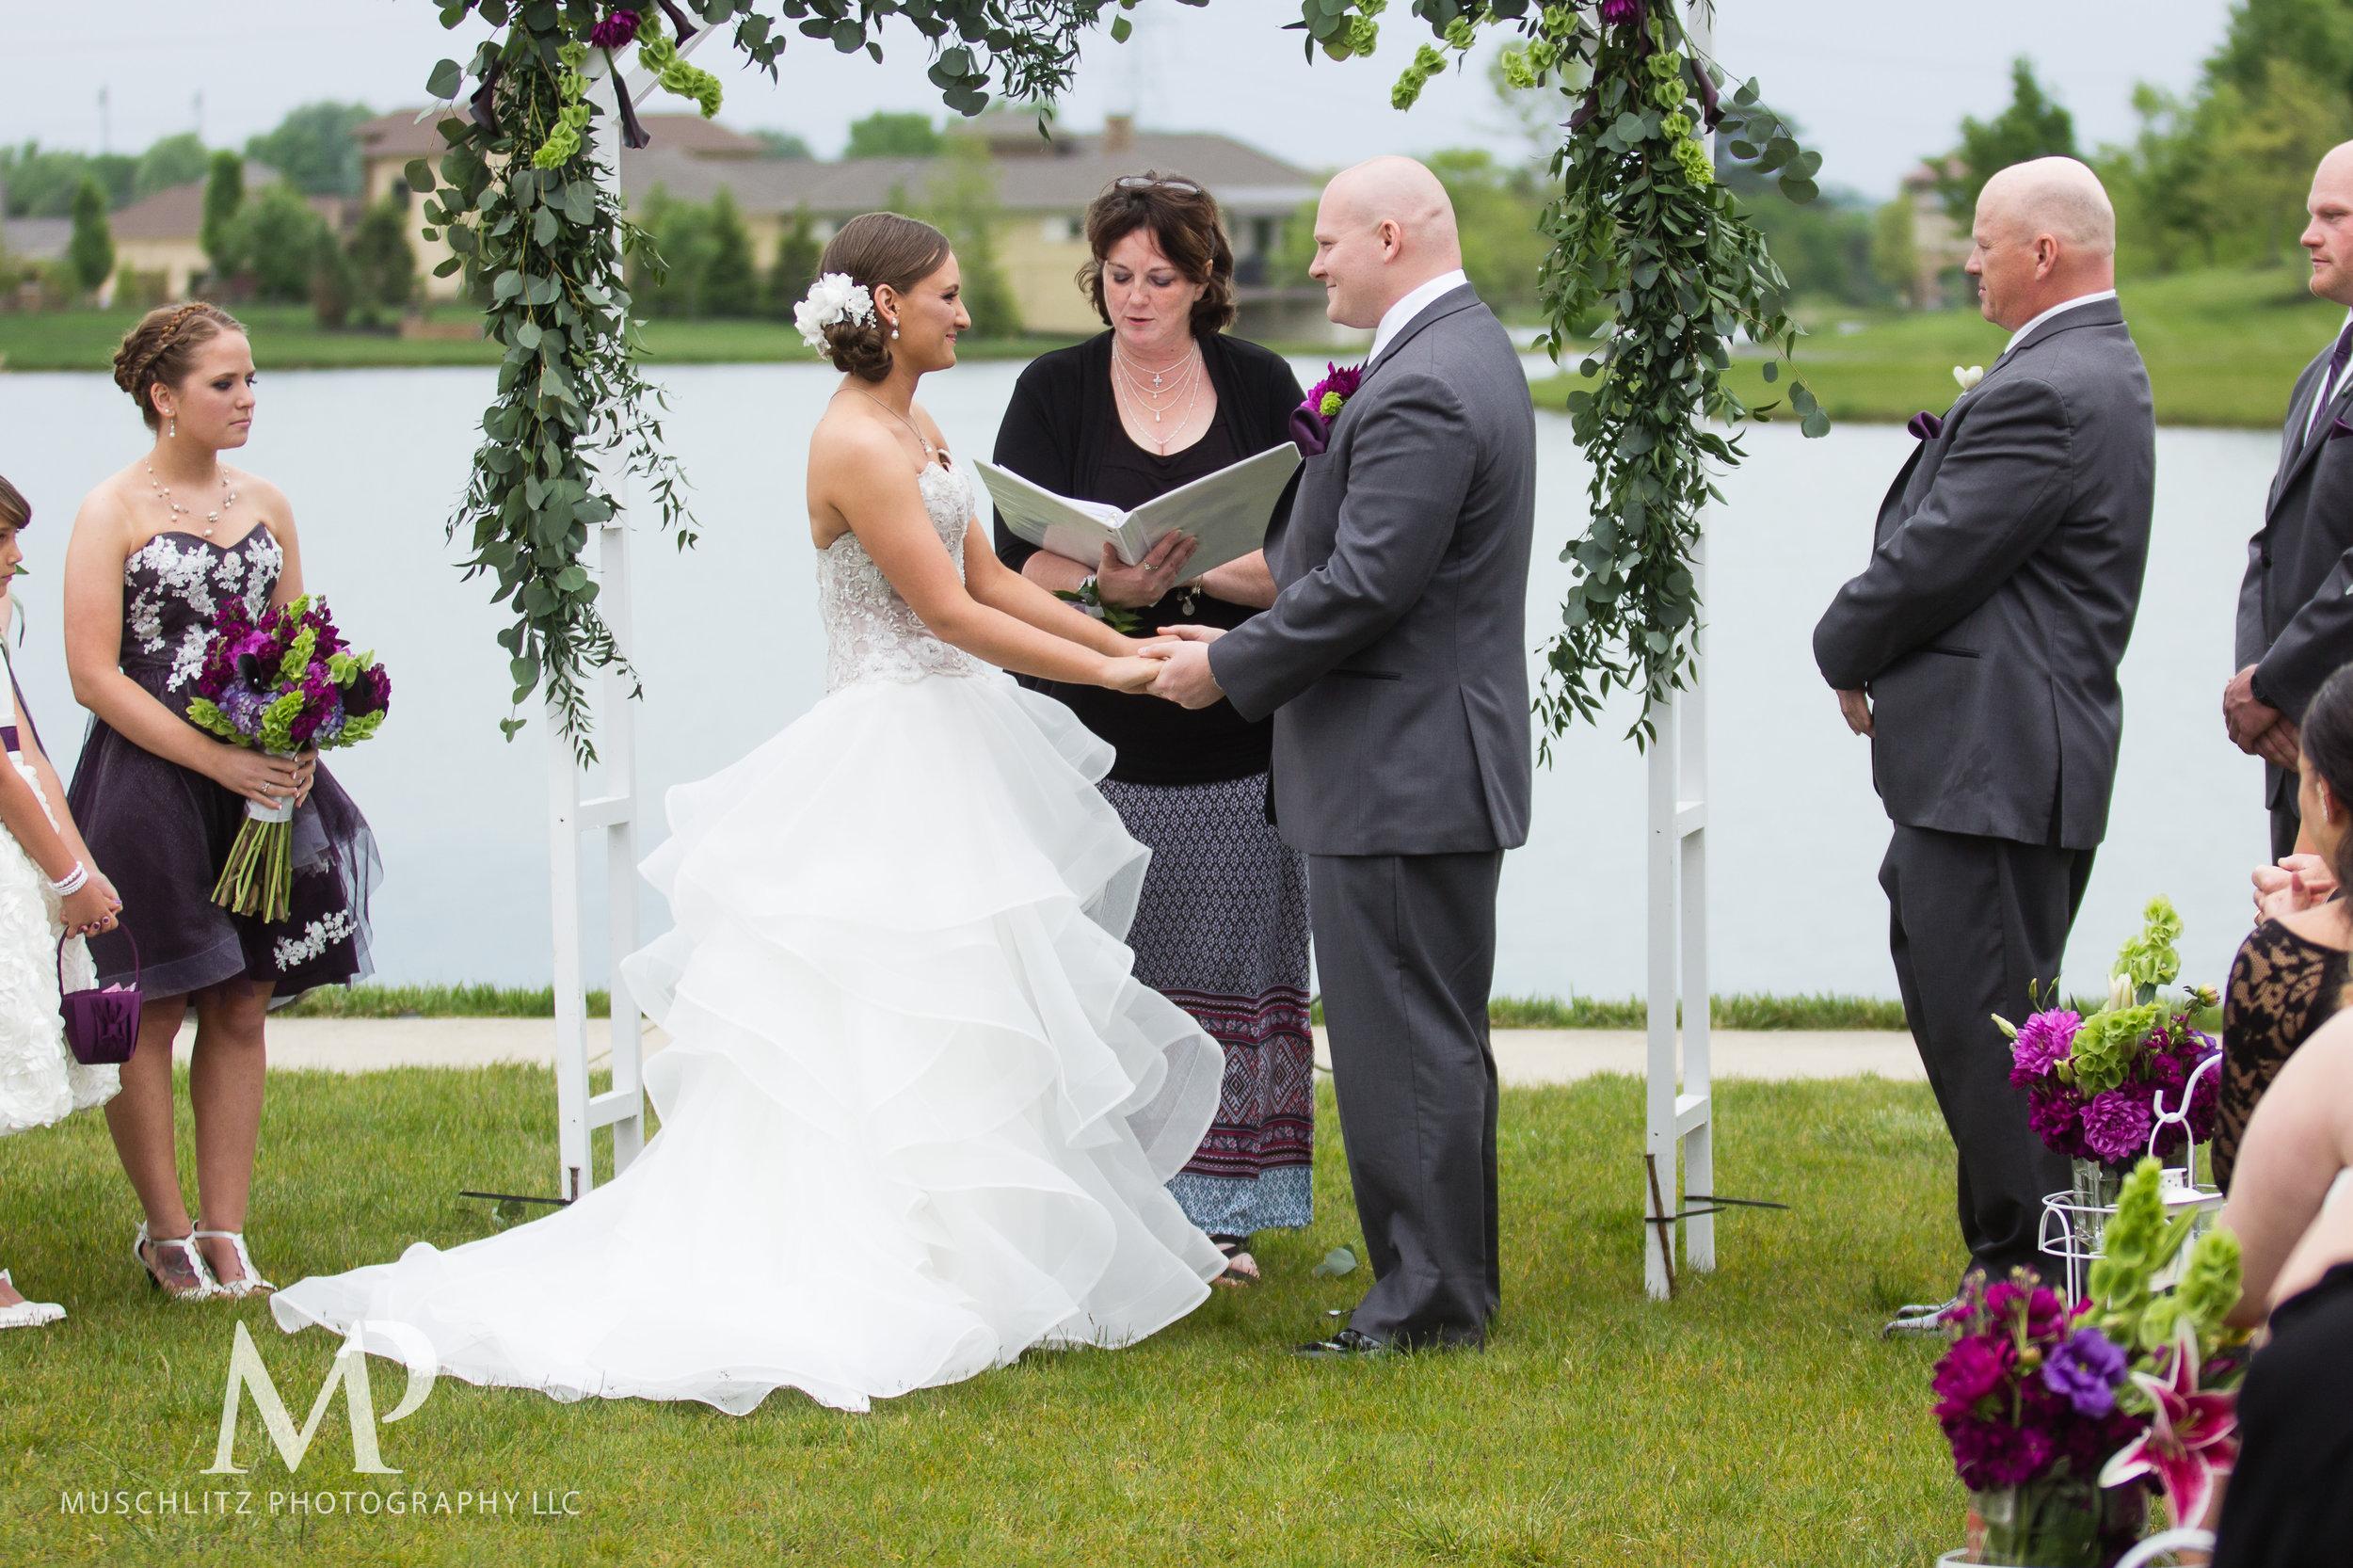 club-at-corazon-wedding-ceremony-reception-columbus-dublin-ohio-ohio-university-theme-032.JPG